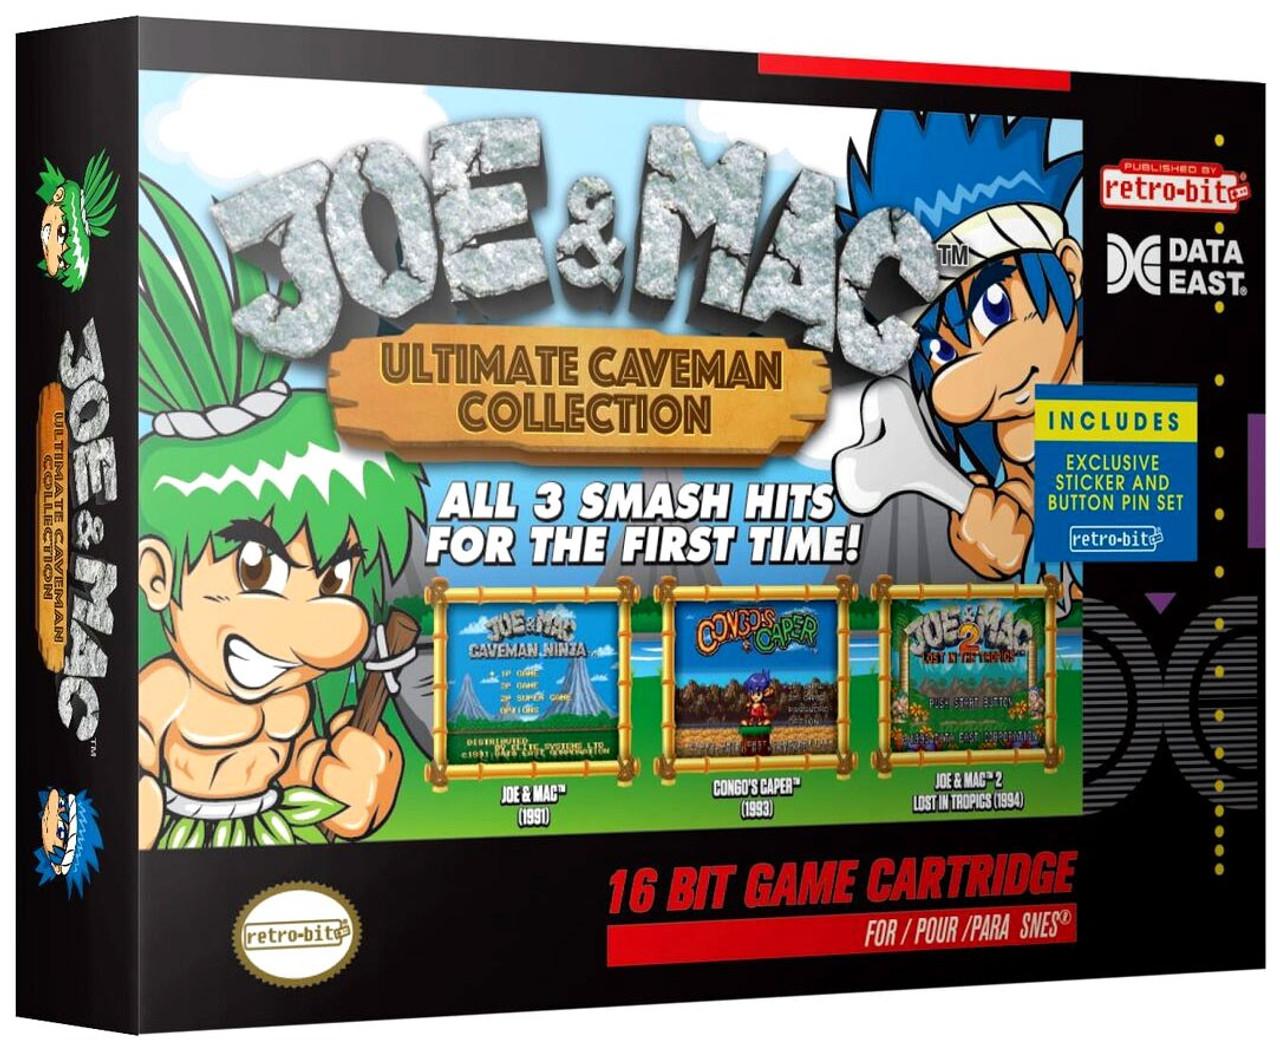 Data East Snes Data East Joe And Mac Collection Video Game Cartridge 3 Games Retro Bit Toywiz